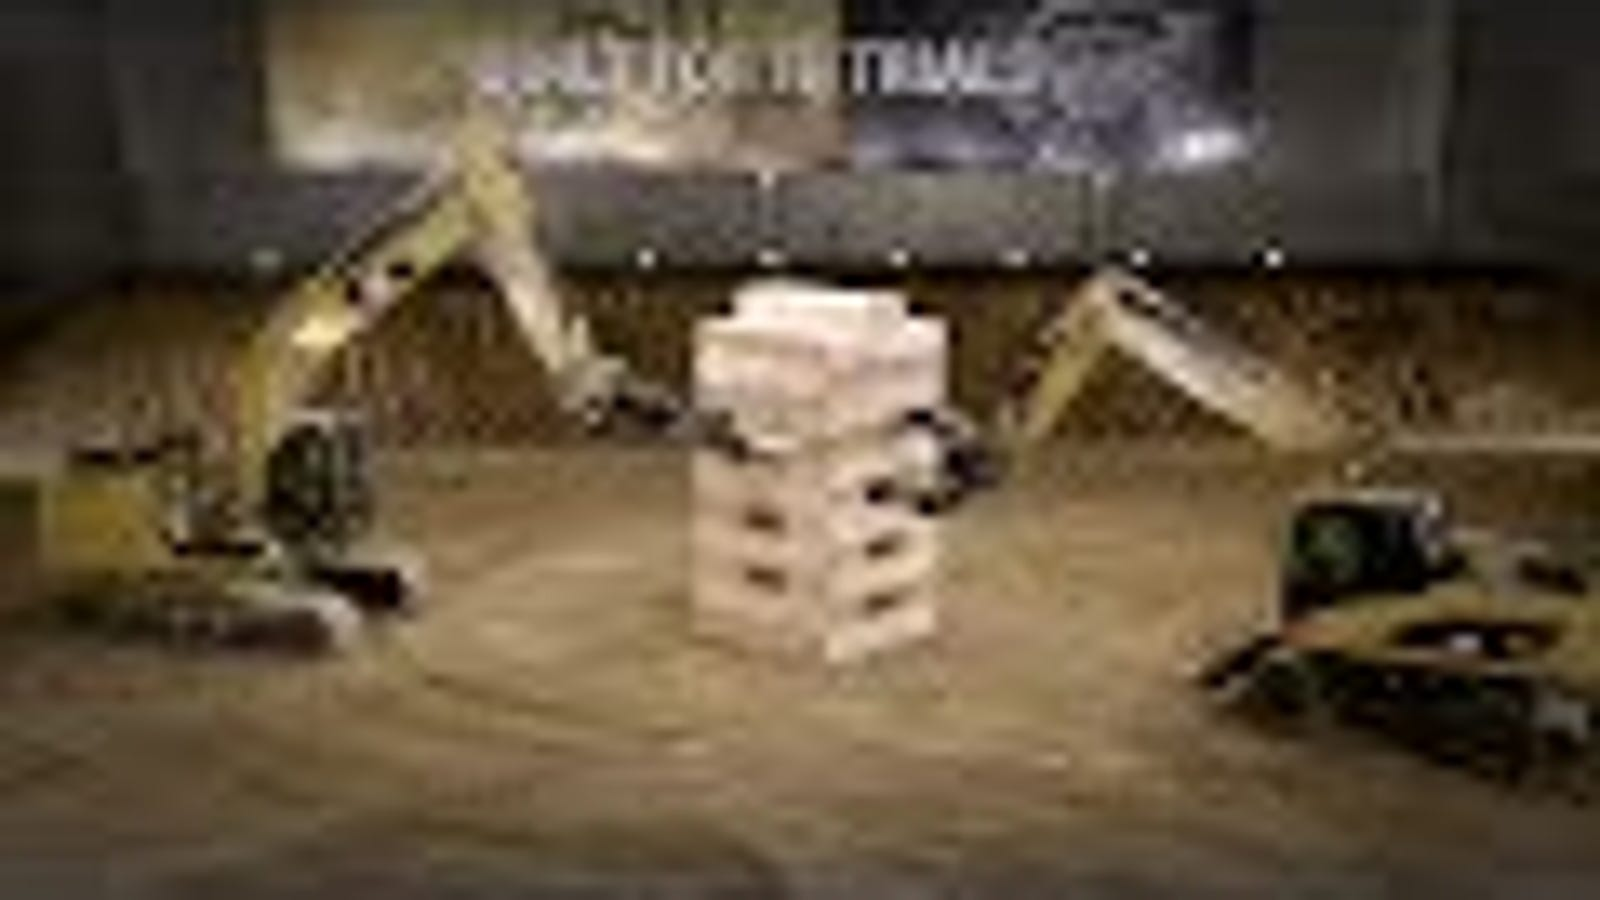 Watch Five Giant Cat Excavators Play the World's Biggest Game of Jenga